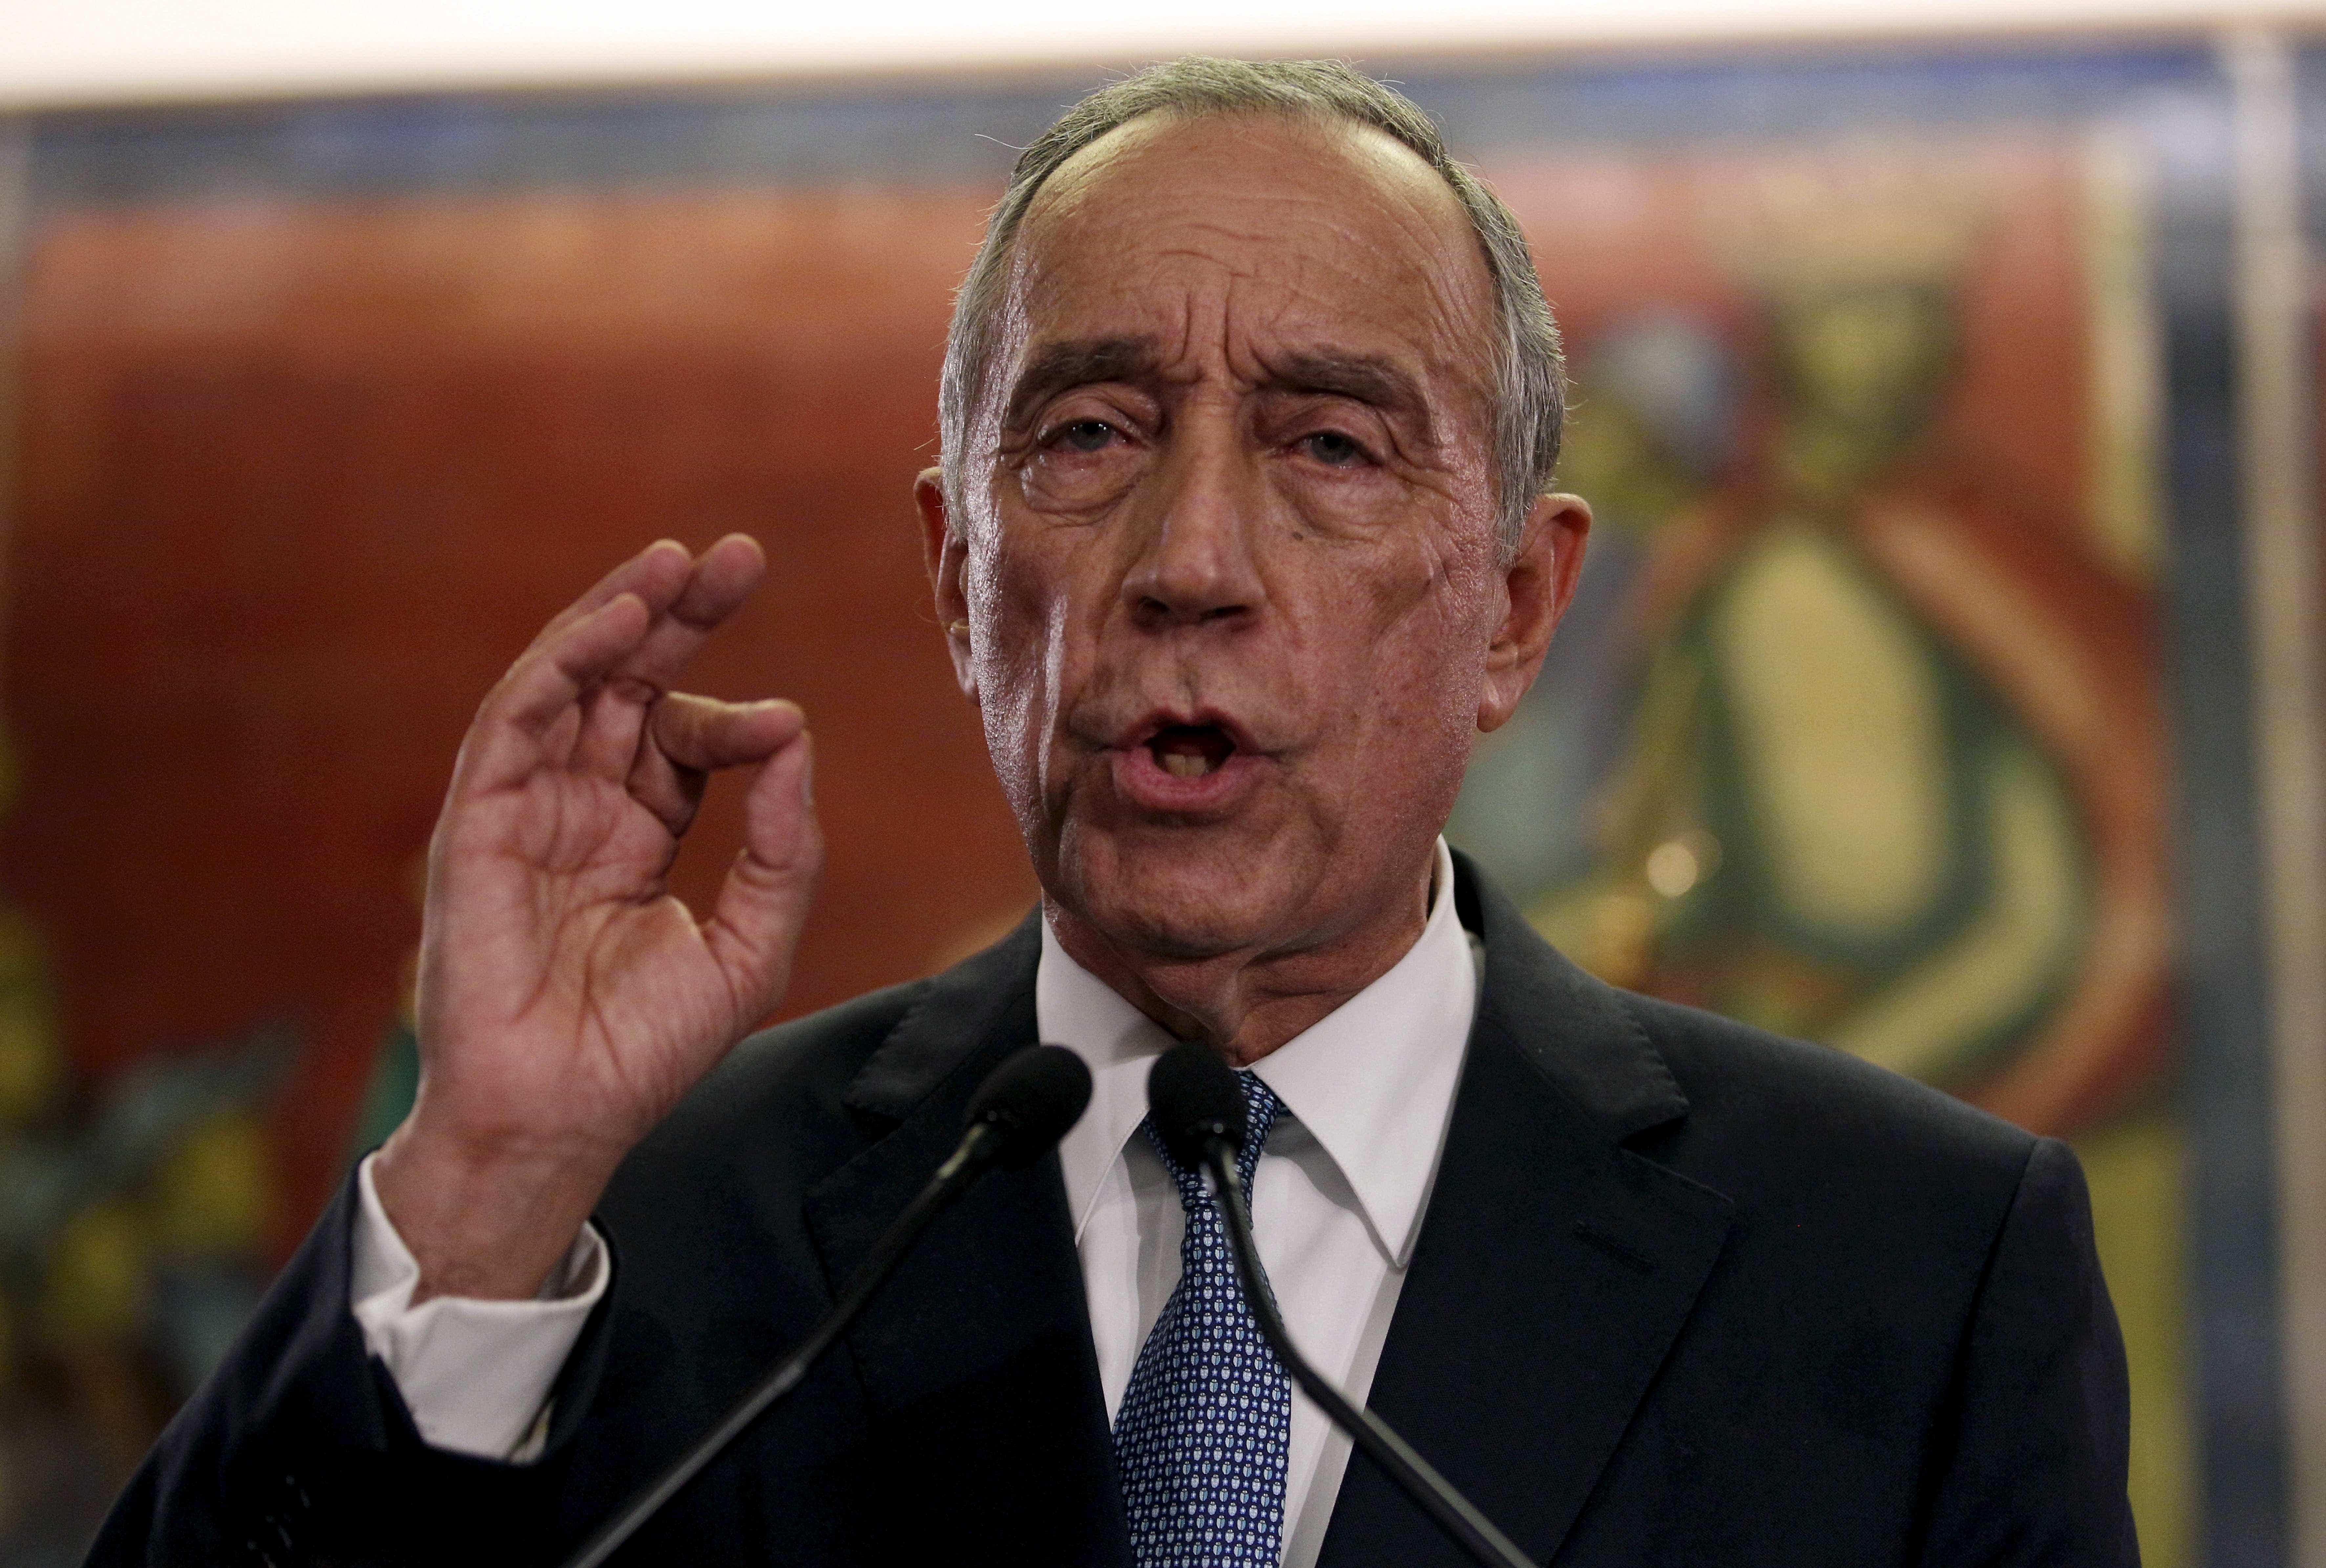 Presidente da República lamenta morte de jornalista fundador do Público